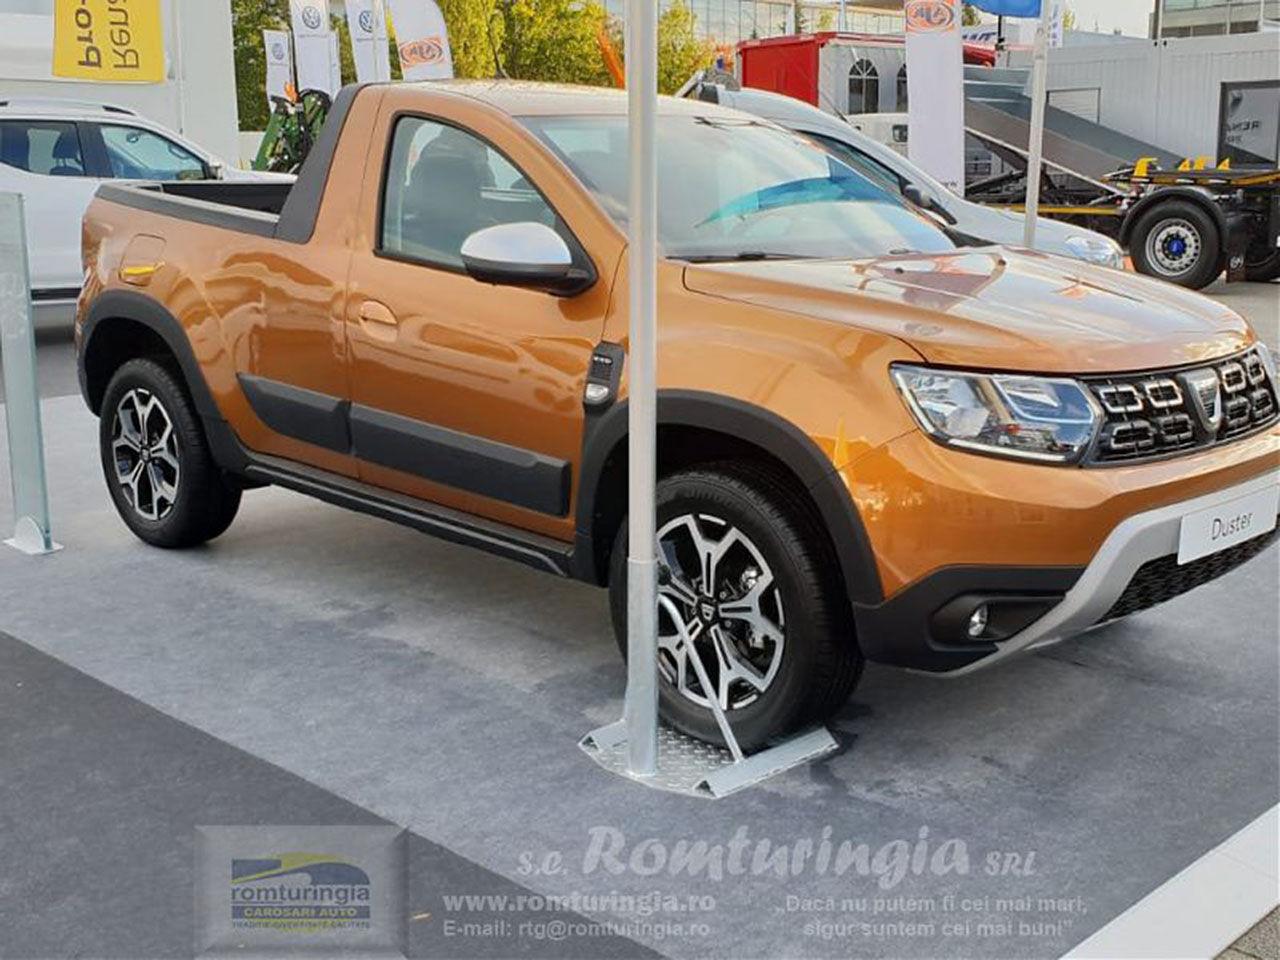 Dacia Duster kommer som pickup